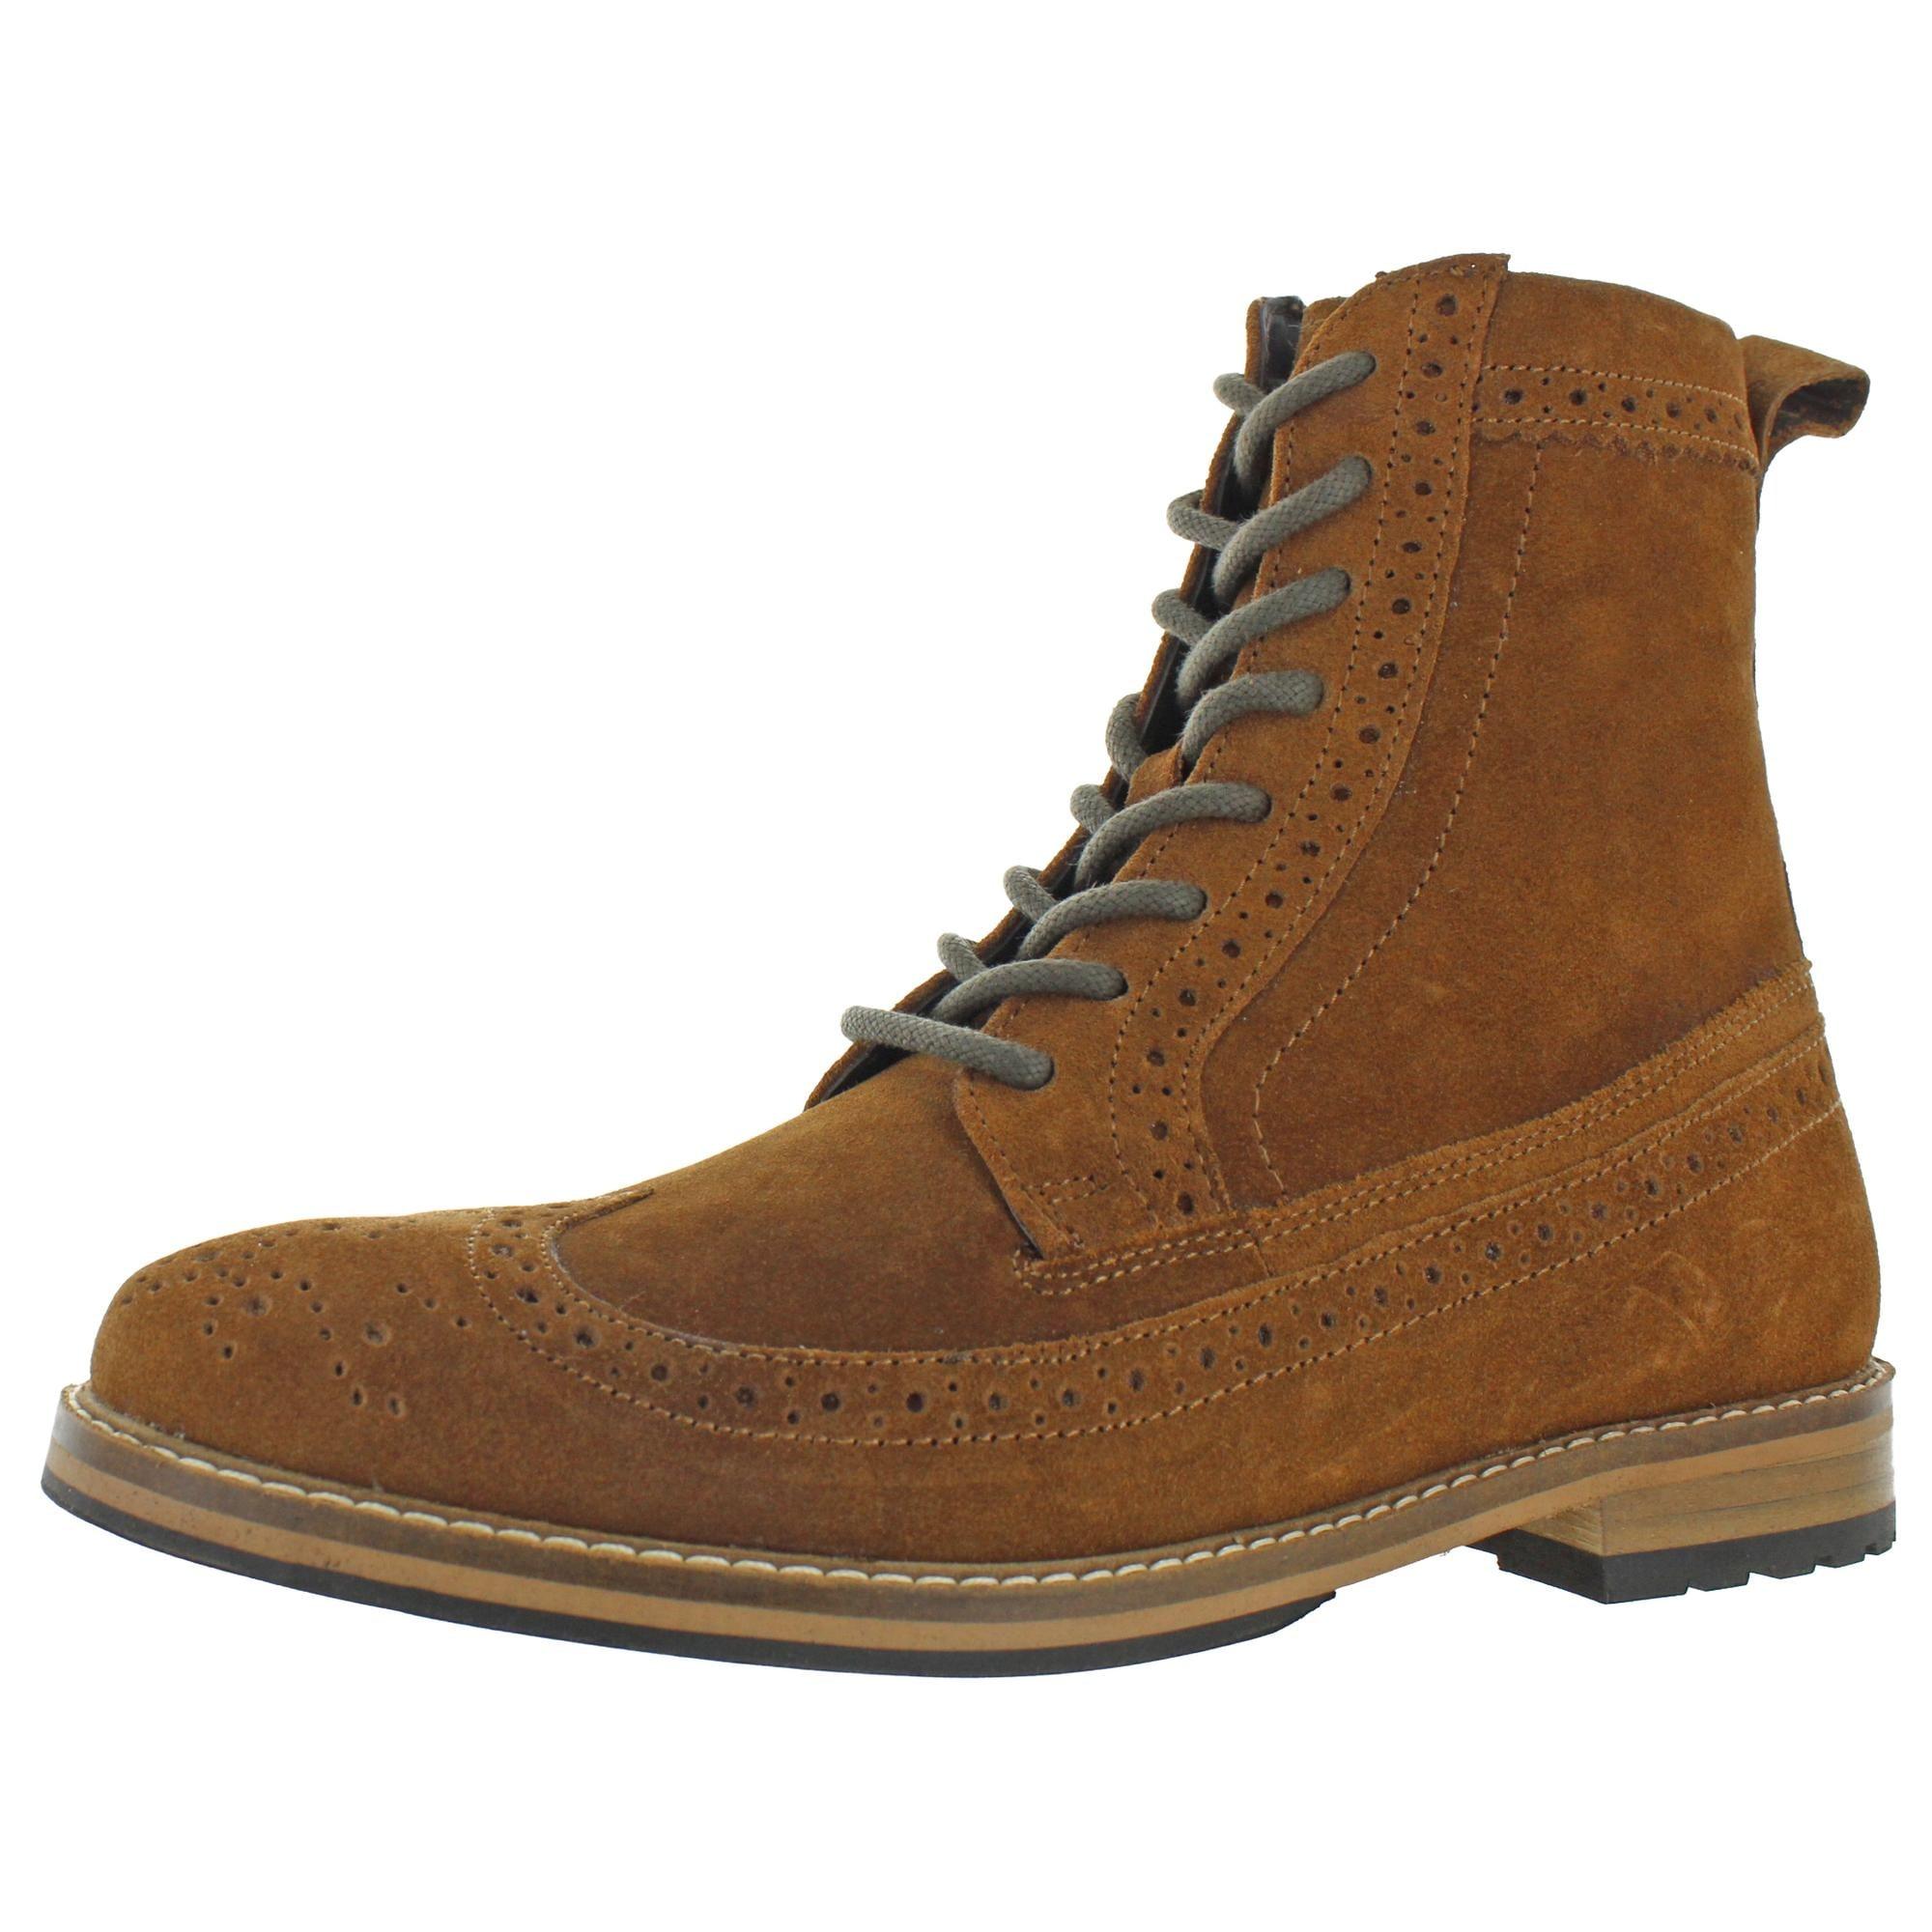 Memory Foam Wingtip Boots - Chestnut